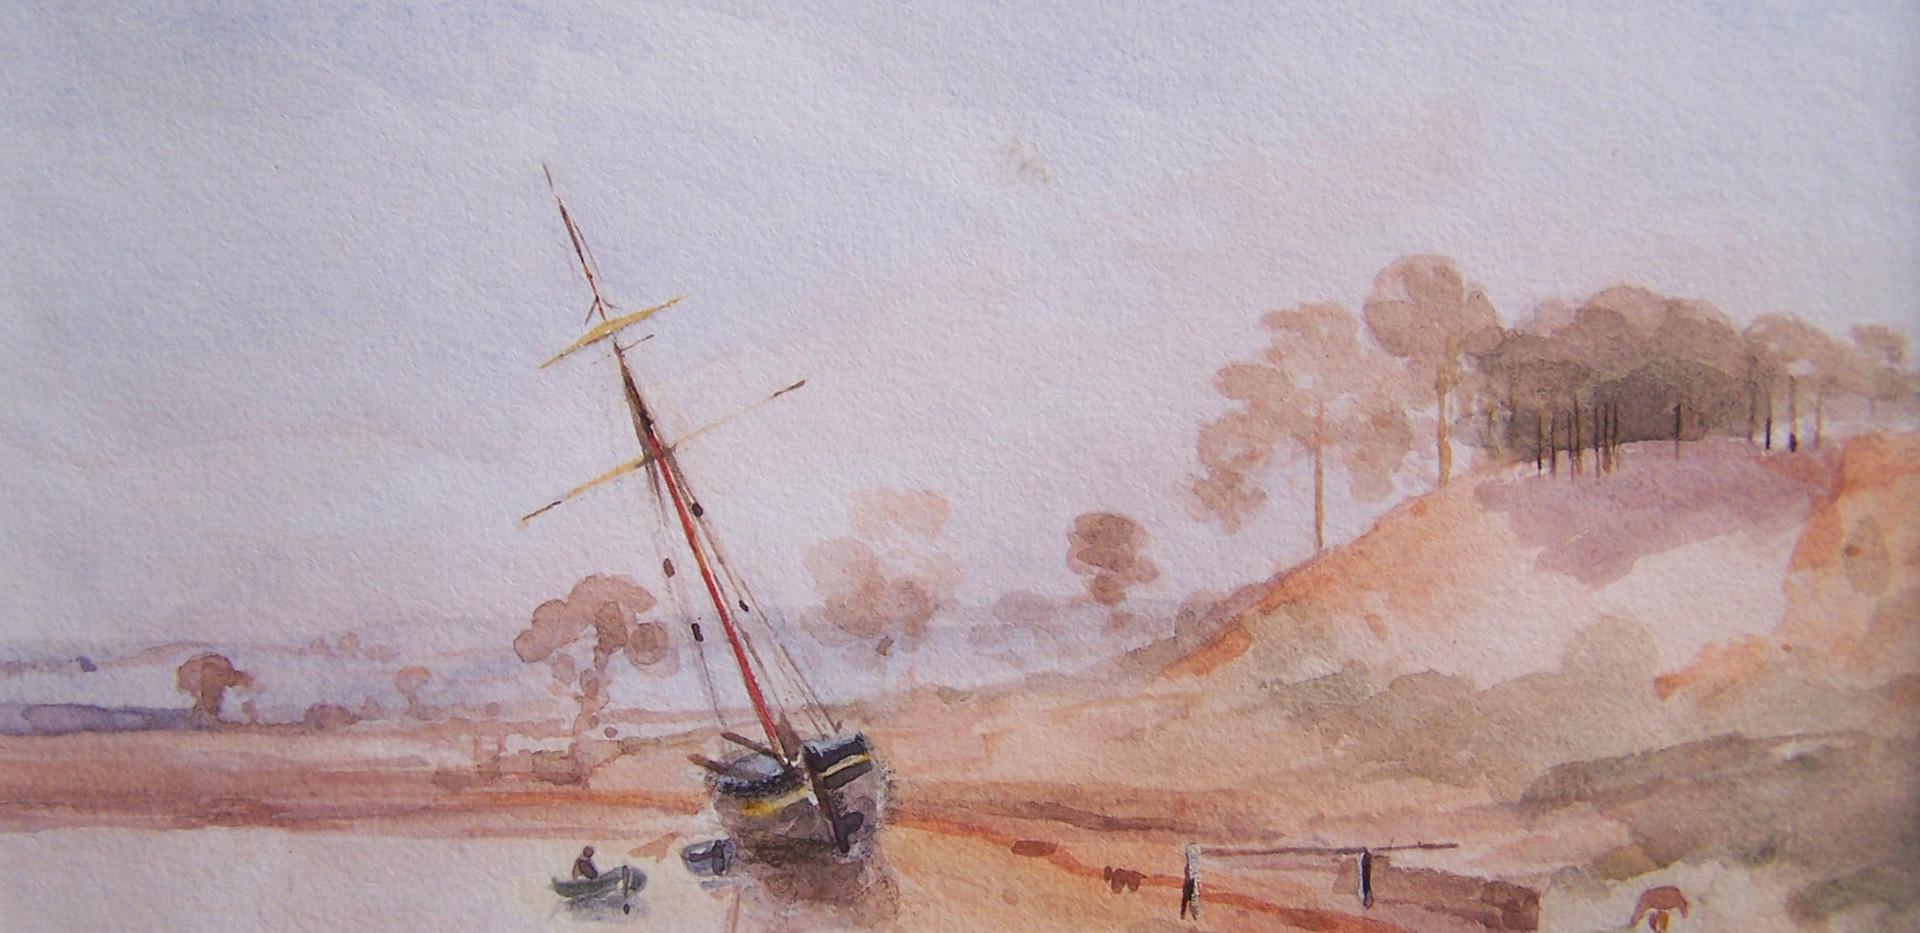 Near Kyson Point, On the Deben, Watercolour by Thomas Churchyard